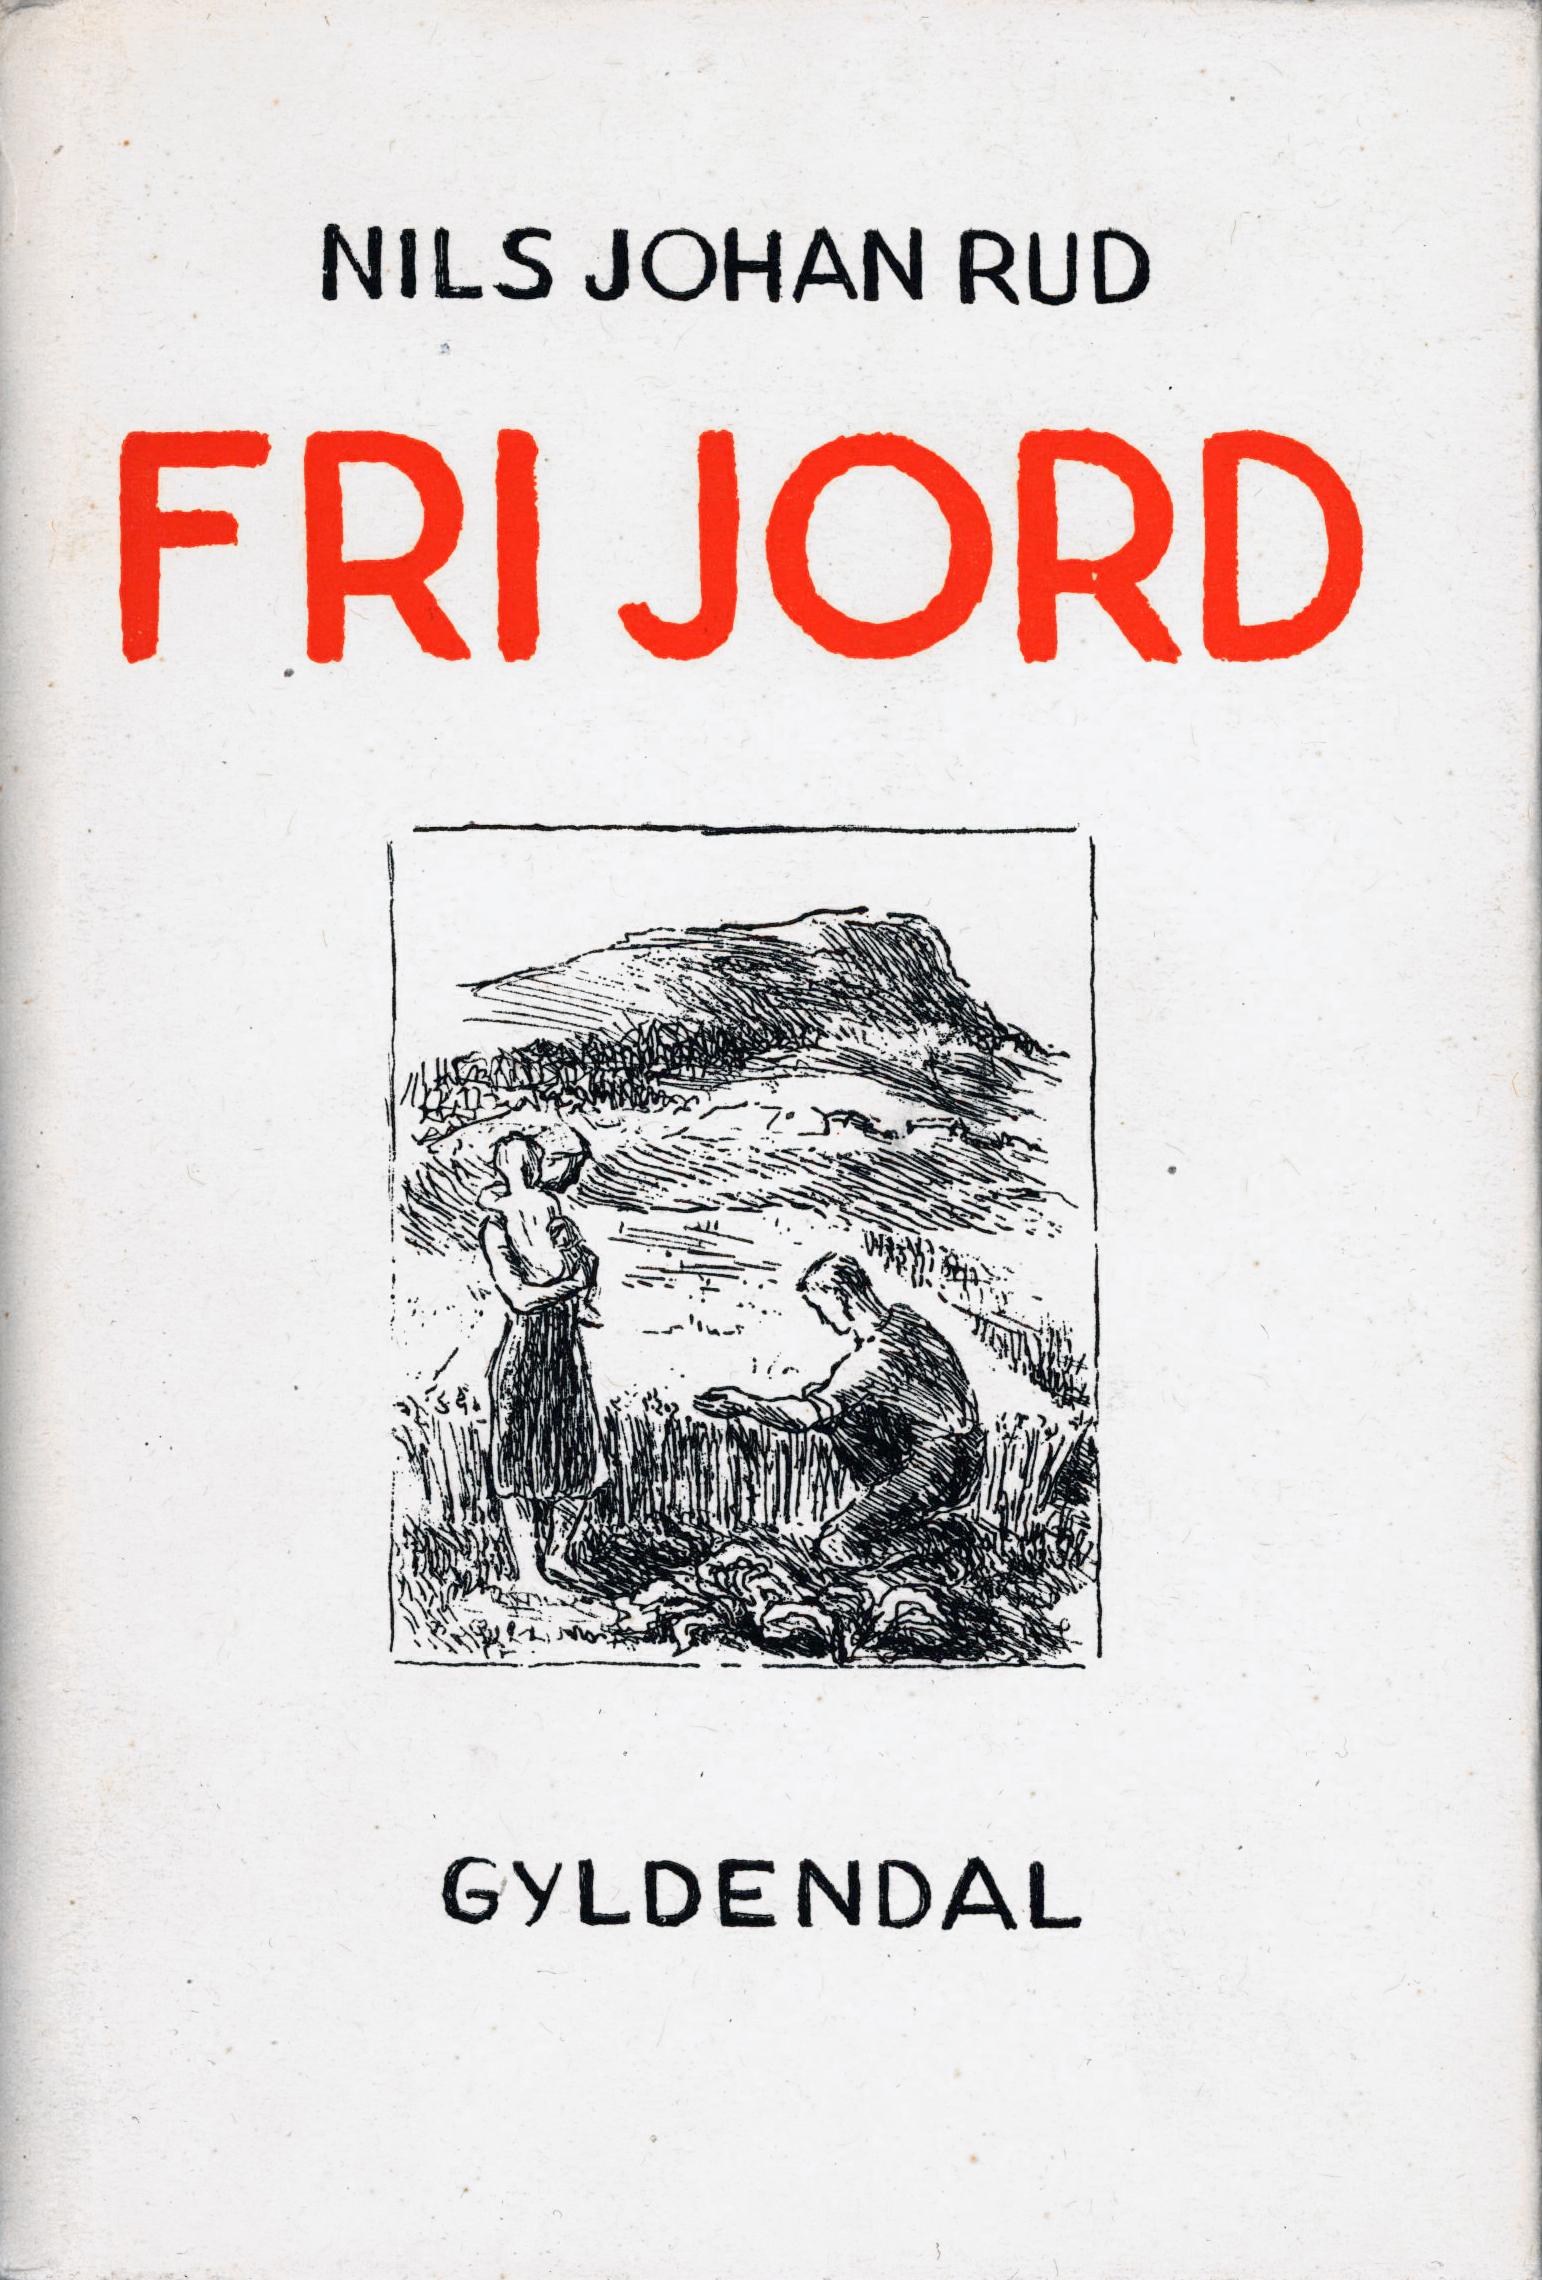 Nils Johan Rud: Fri jord